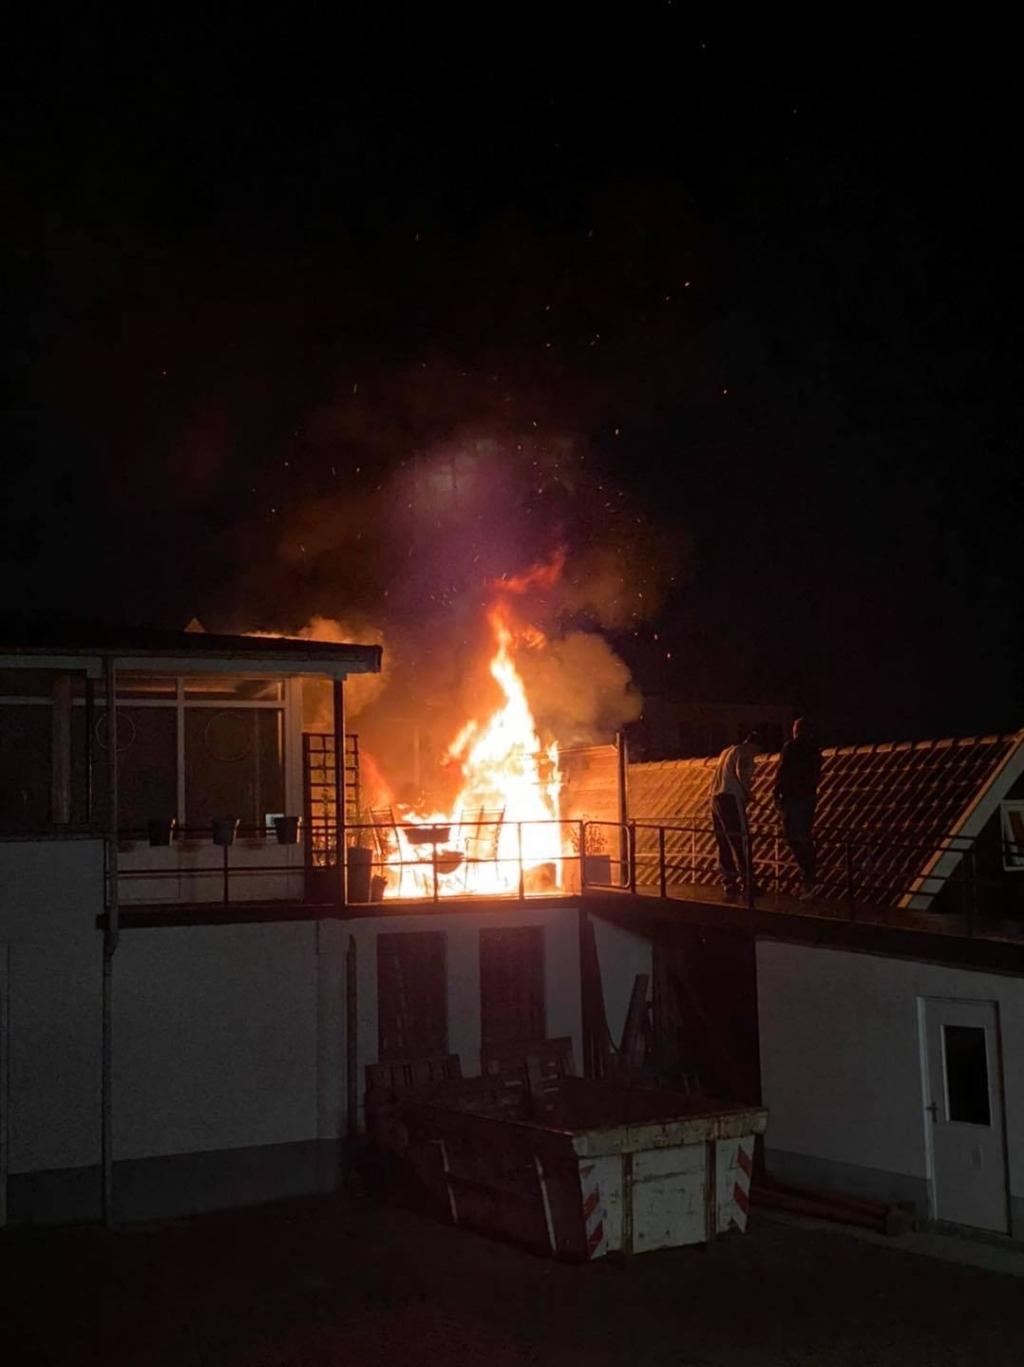 Brandweer Hardinxveld-Giessendam © BDU media